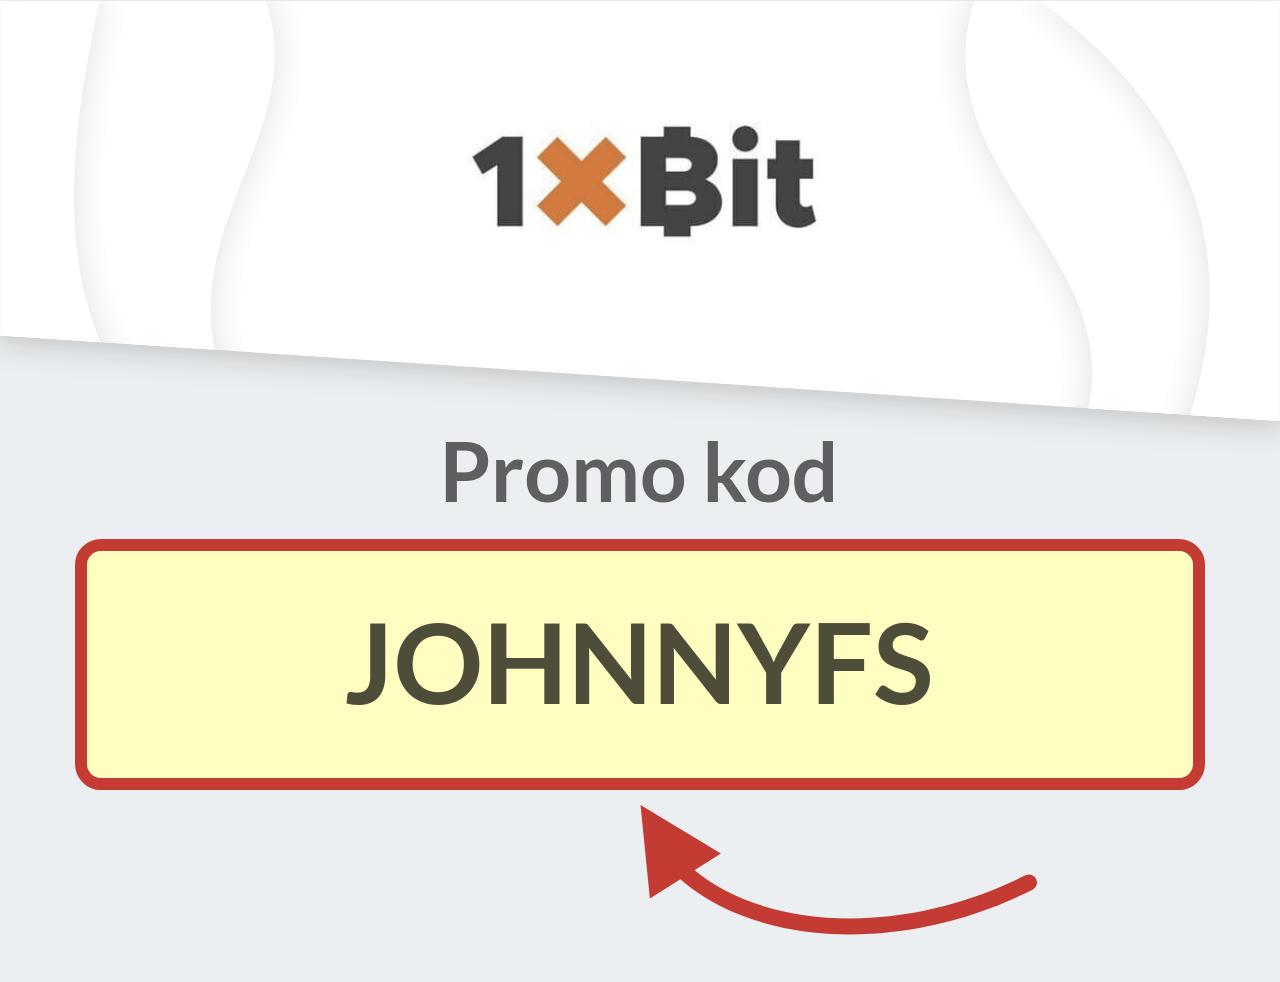 1xBit Promo Kod